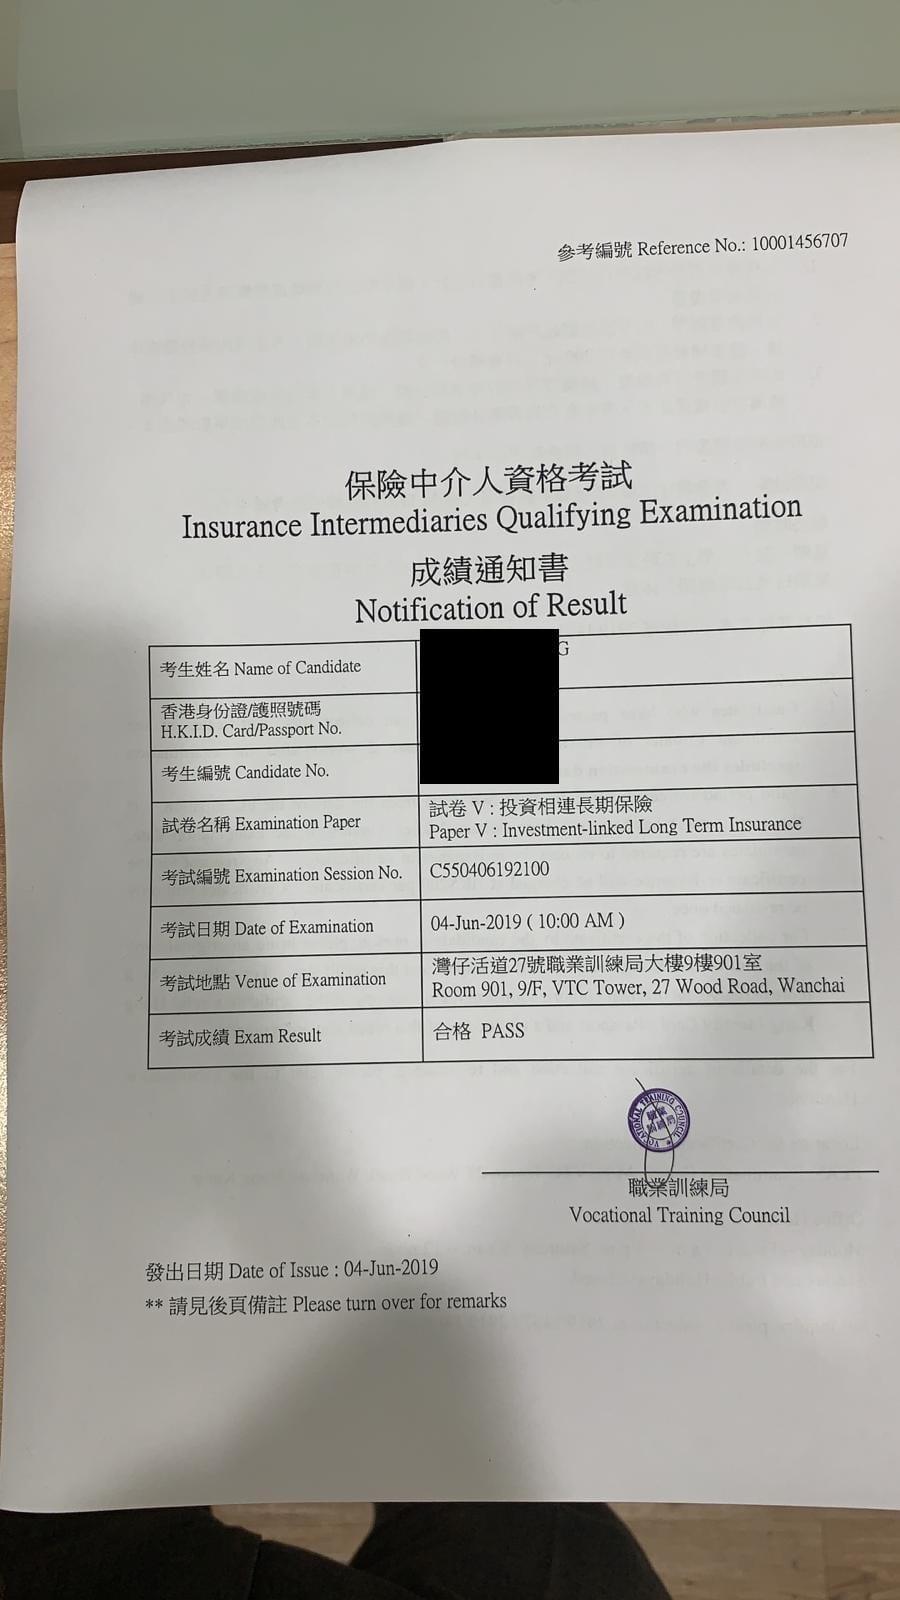 KYS 4/6/2019 IIQE Paper 5 保險中介人資格考試卷五 Pass